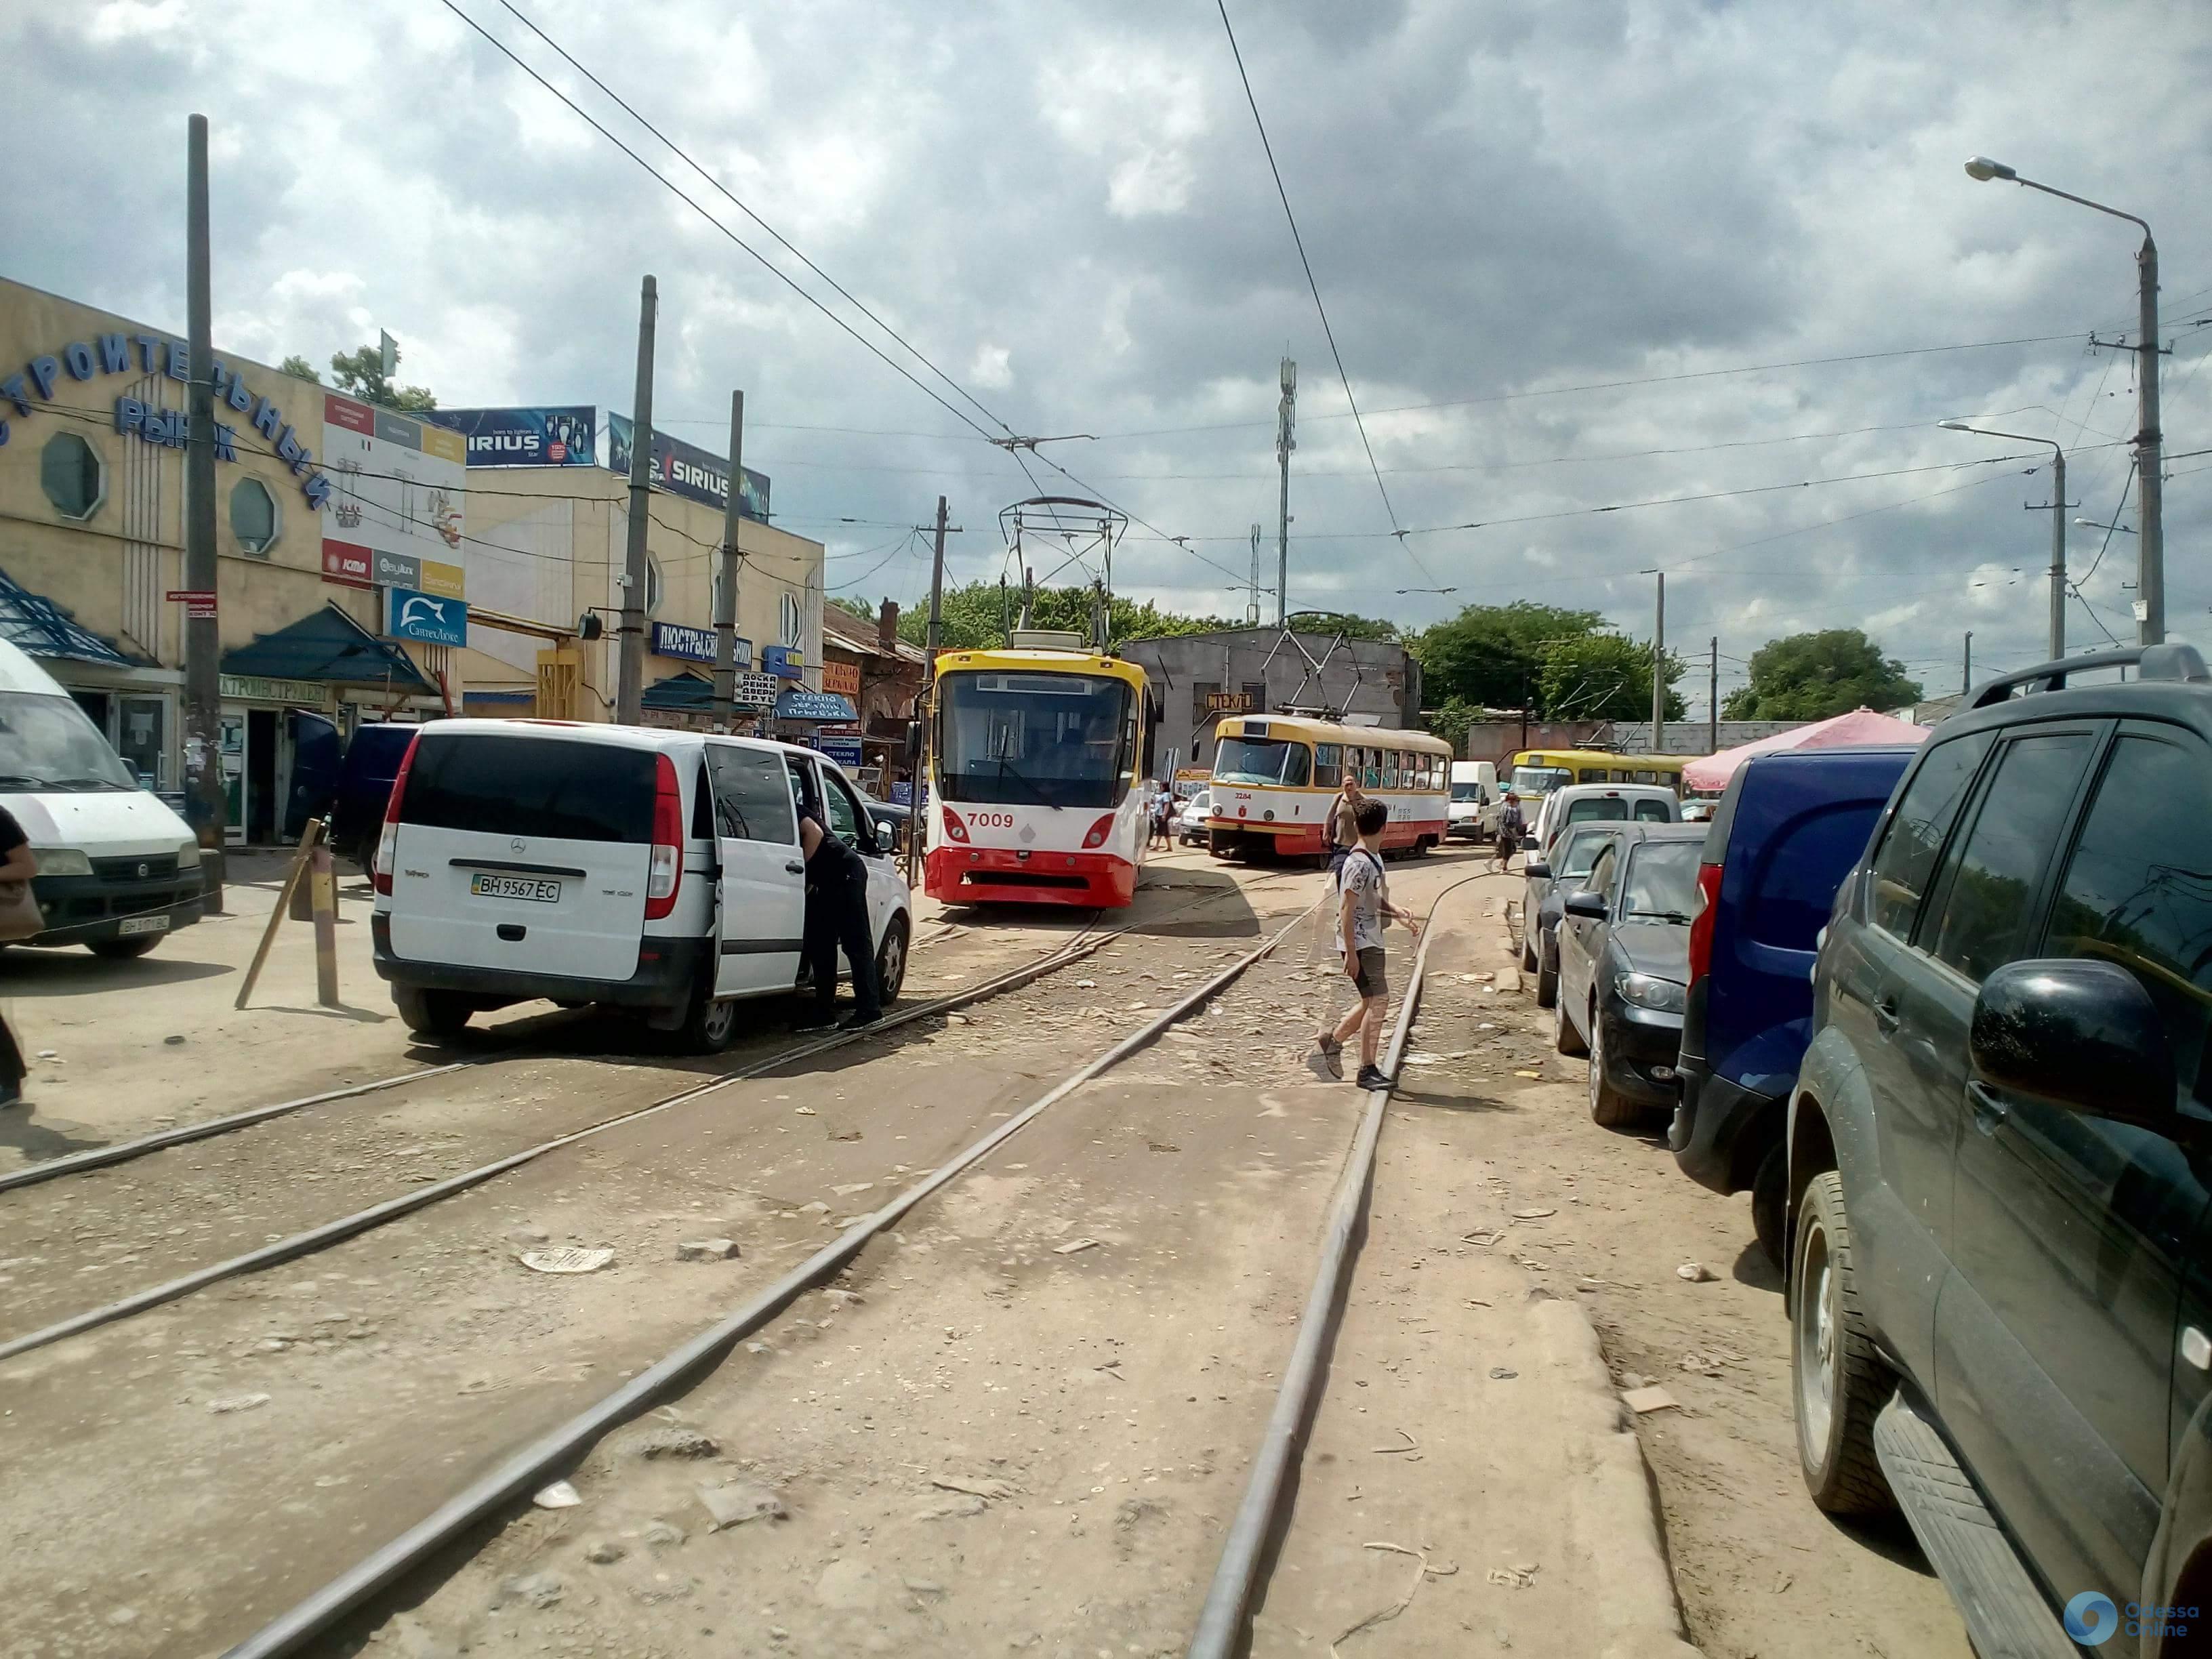 Из-за припаркованного авто в Одессе стояли трамваи